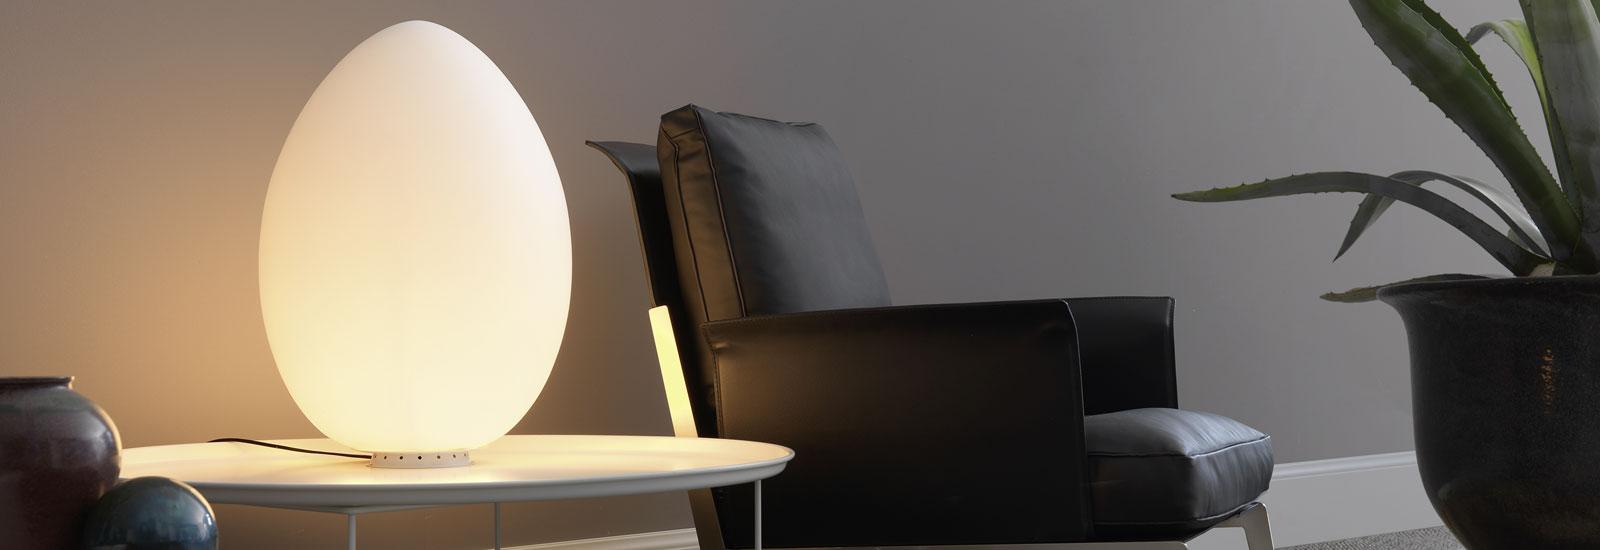 Zighetti Illuminazione, lampade, lampadari, led, arredobagno